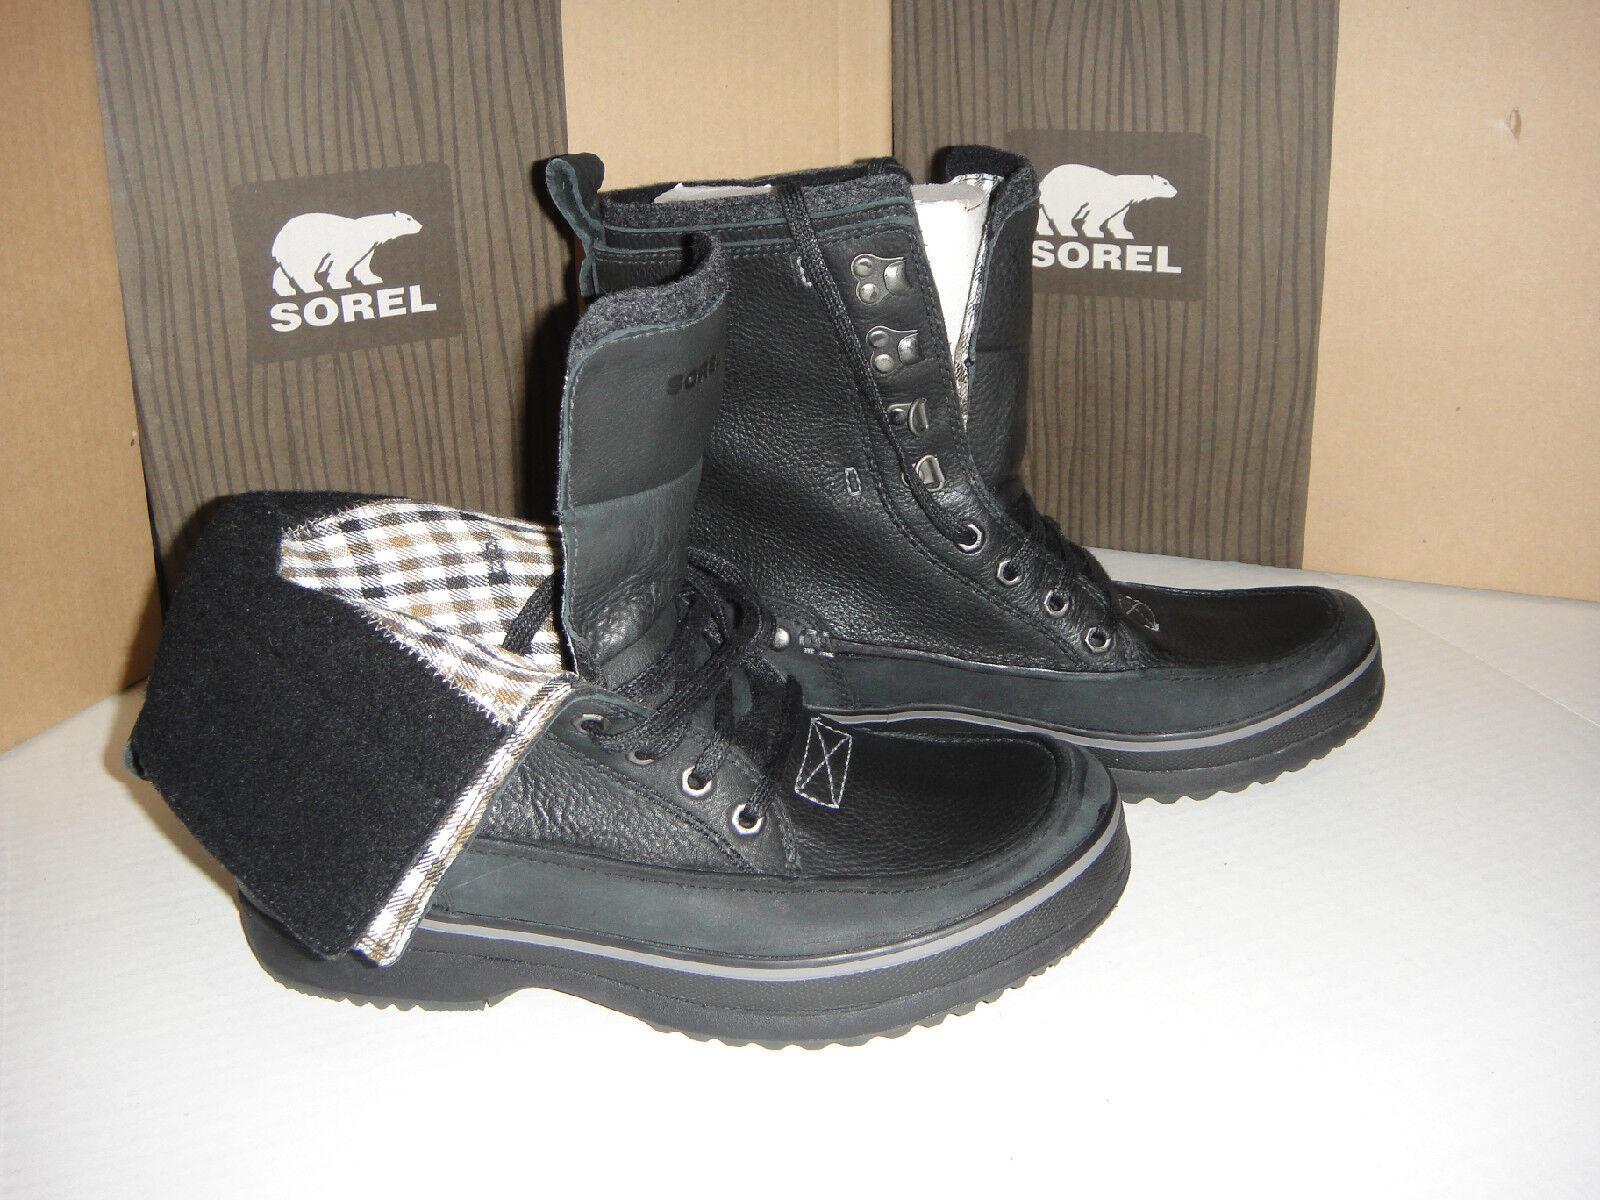 NEW SOREL KINGSTONE PEAK  Boot Leather/Nubuck Black/DarkNavy size 10 D